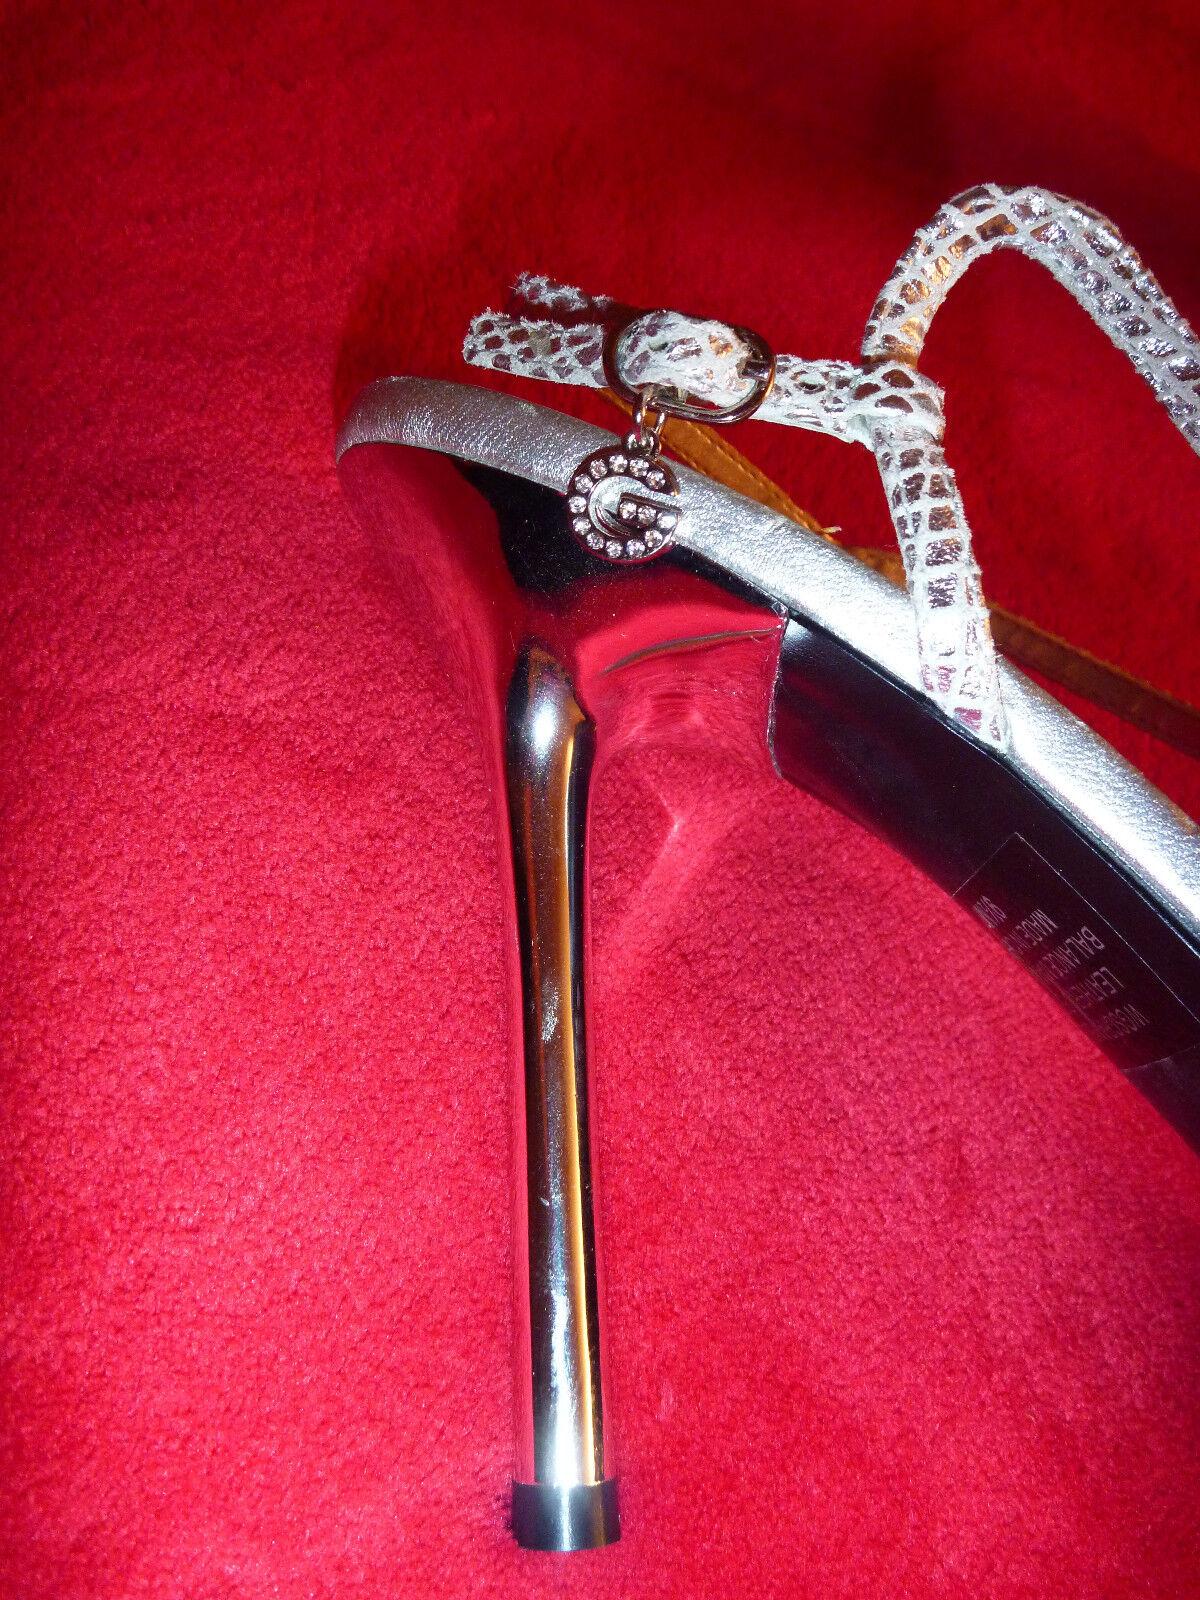 Guess Damens 9.5 High Heel STRAPPY Dress Sandales Metal Silver STRAPPY Heel Leder Prom New b268b2